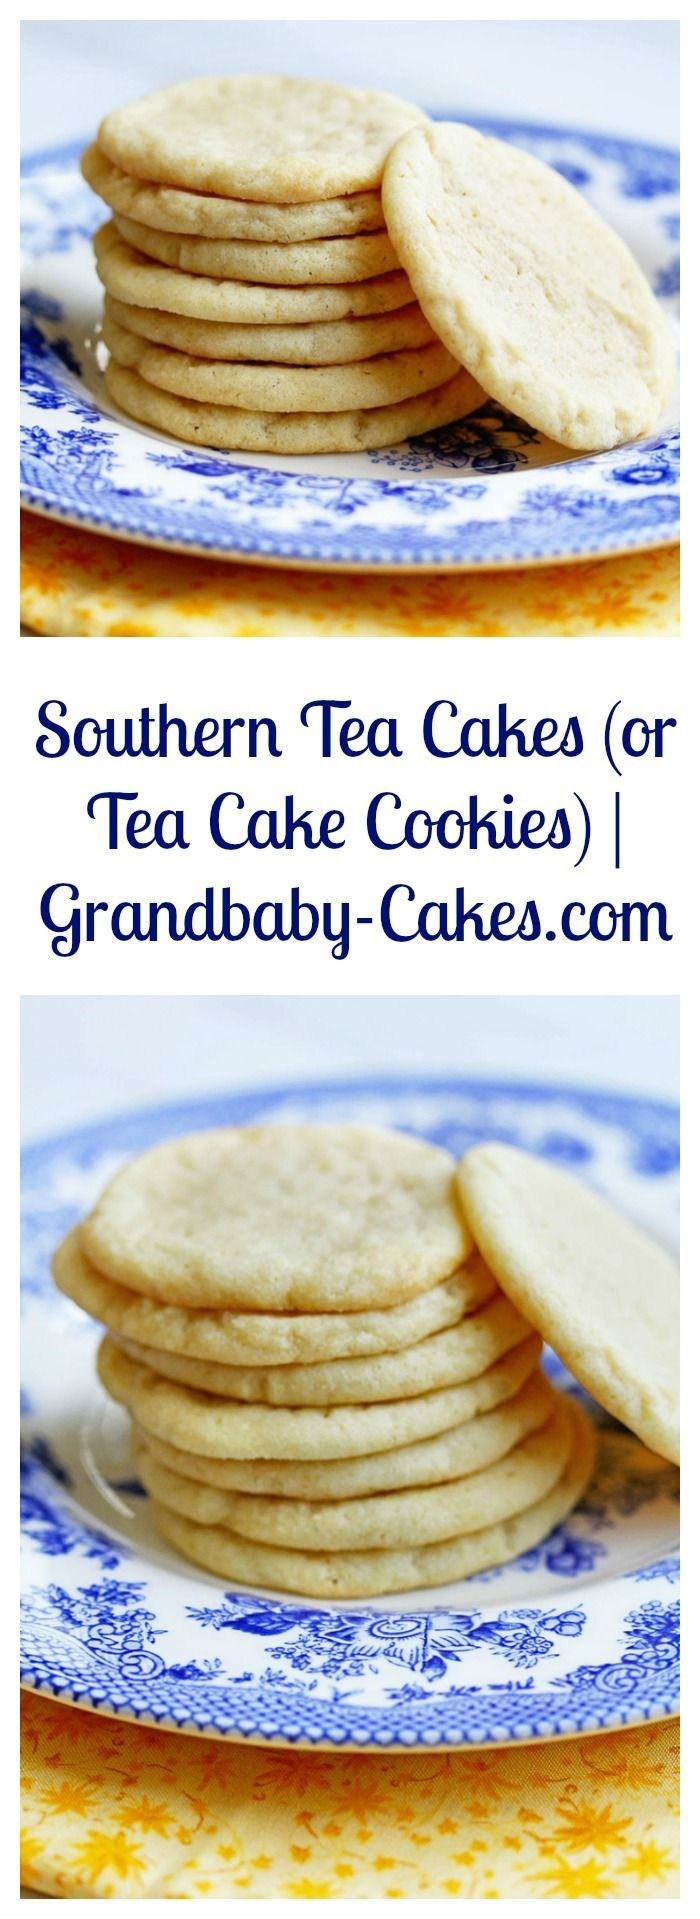 Tea cakes on pinterest tea cakes old fashioned tea cakes and tea